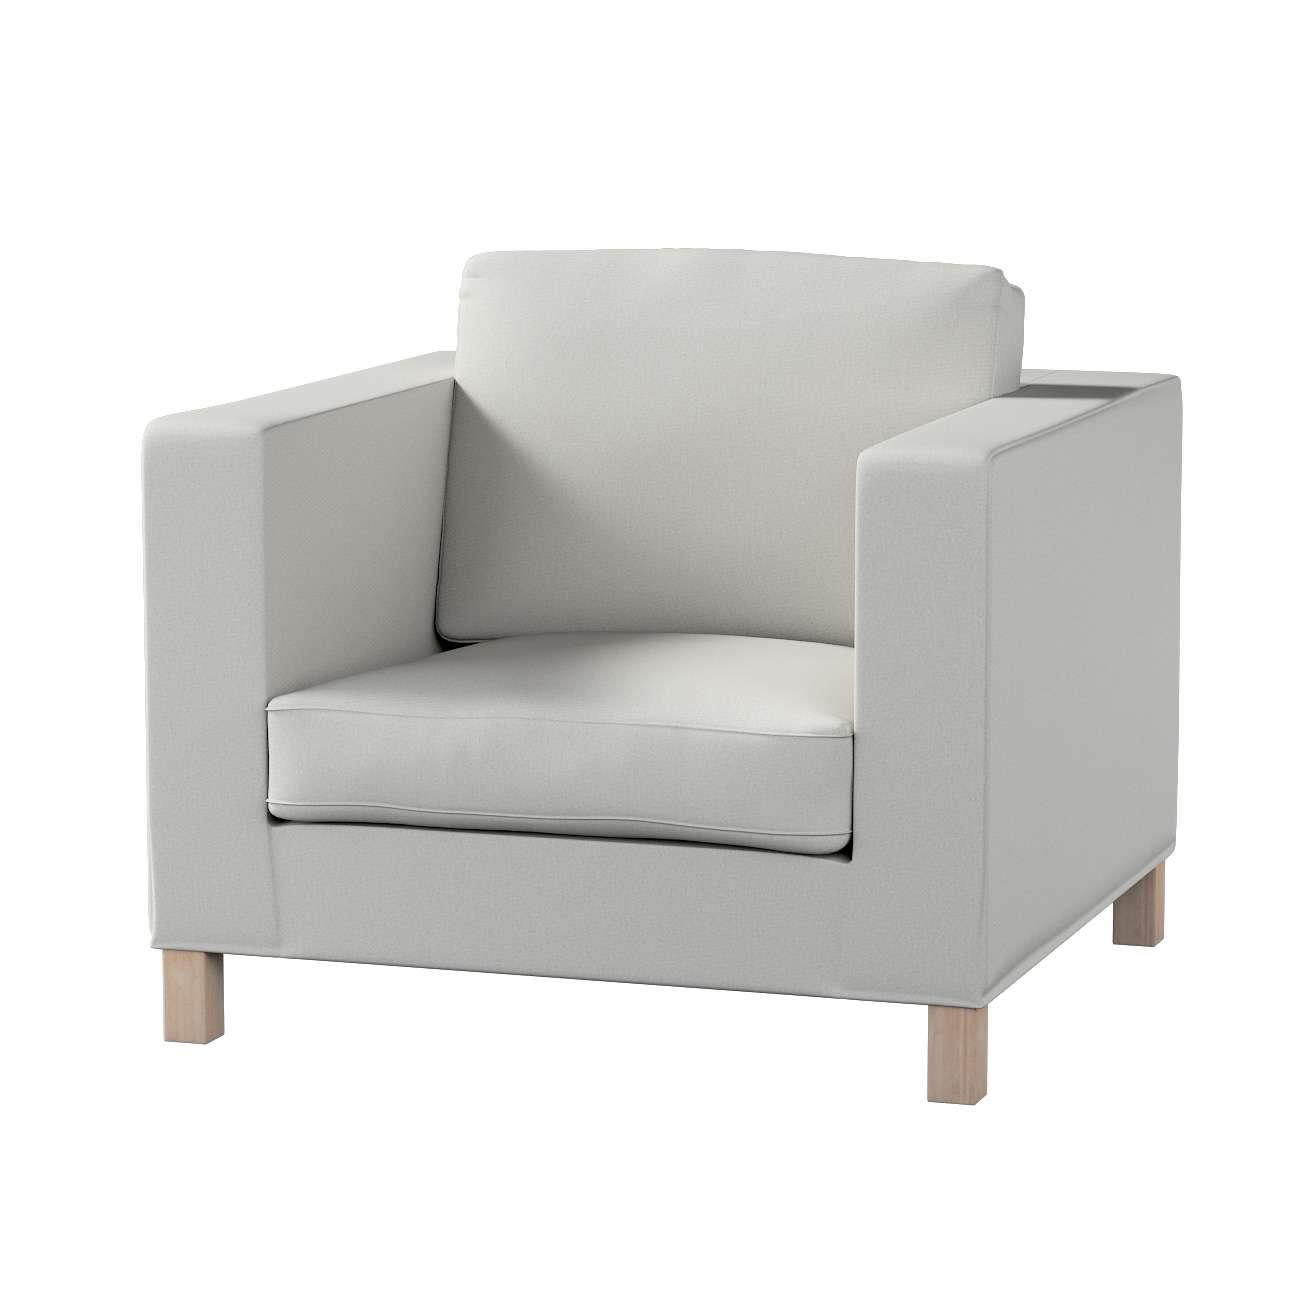 Pokrowiec na fotel Karlanda, krótki fotel Karlanda w kolekcji Etna , tkanina: 705-90